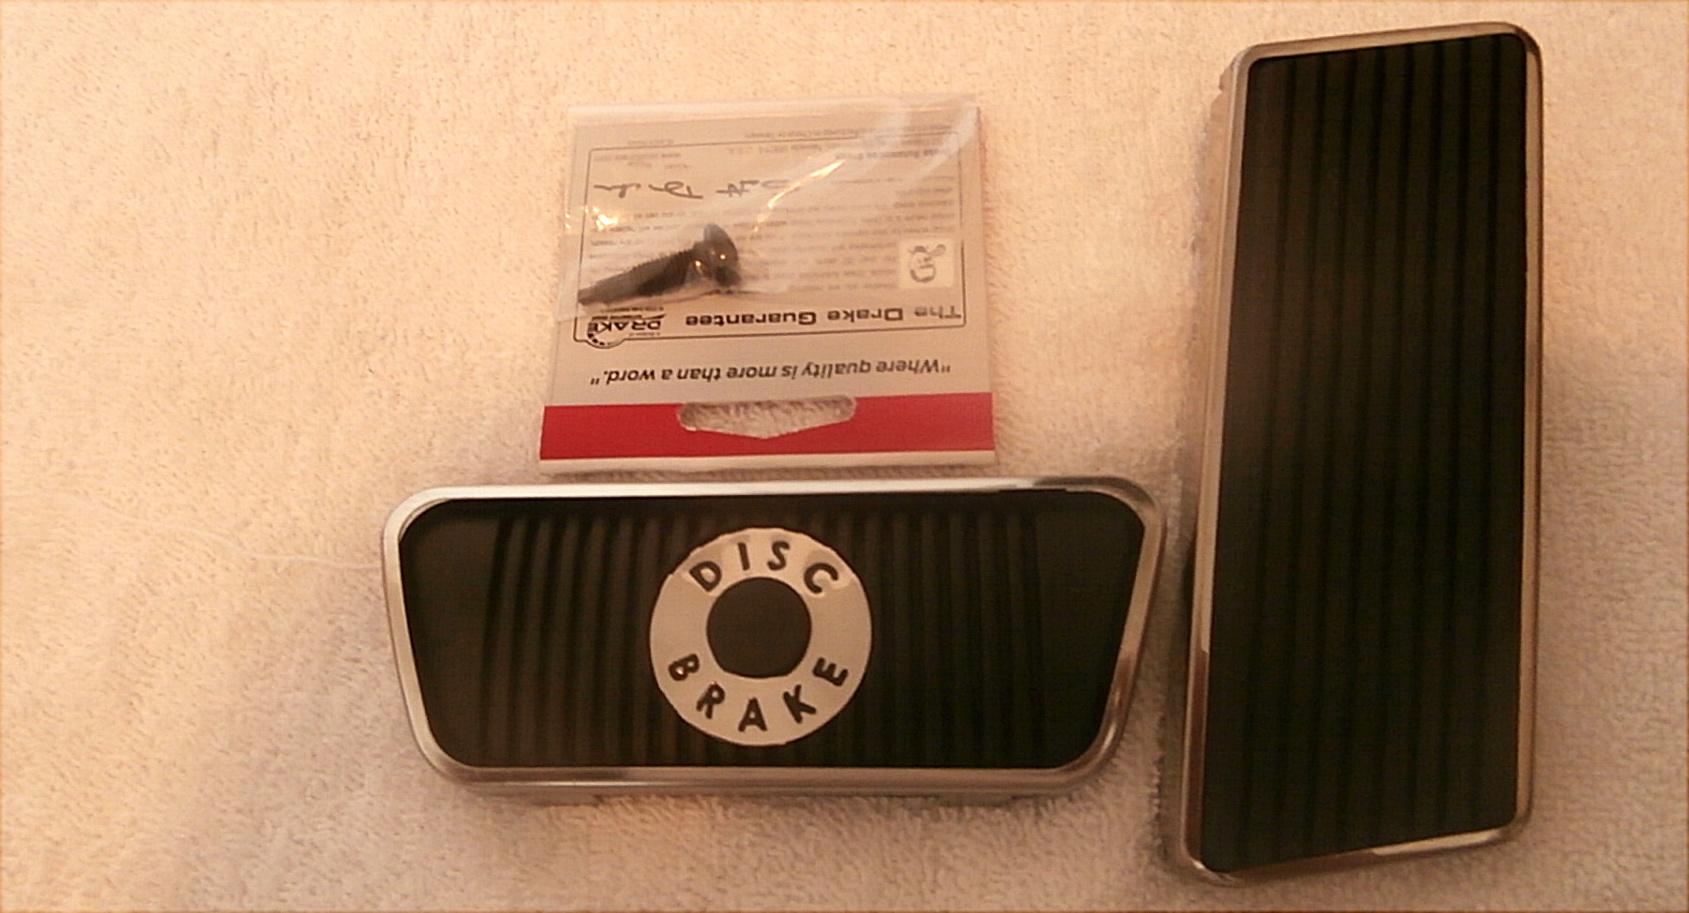 1965-66-67 Ford Mustang Disc Brake Pad, Accelerator Pedal Pad Kit W SS Trim Ring